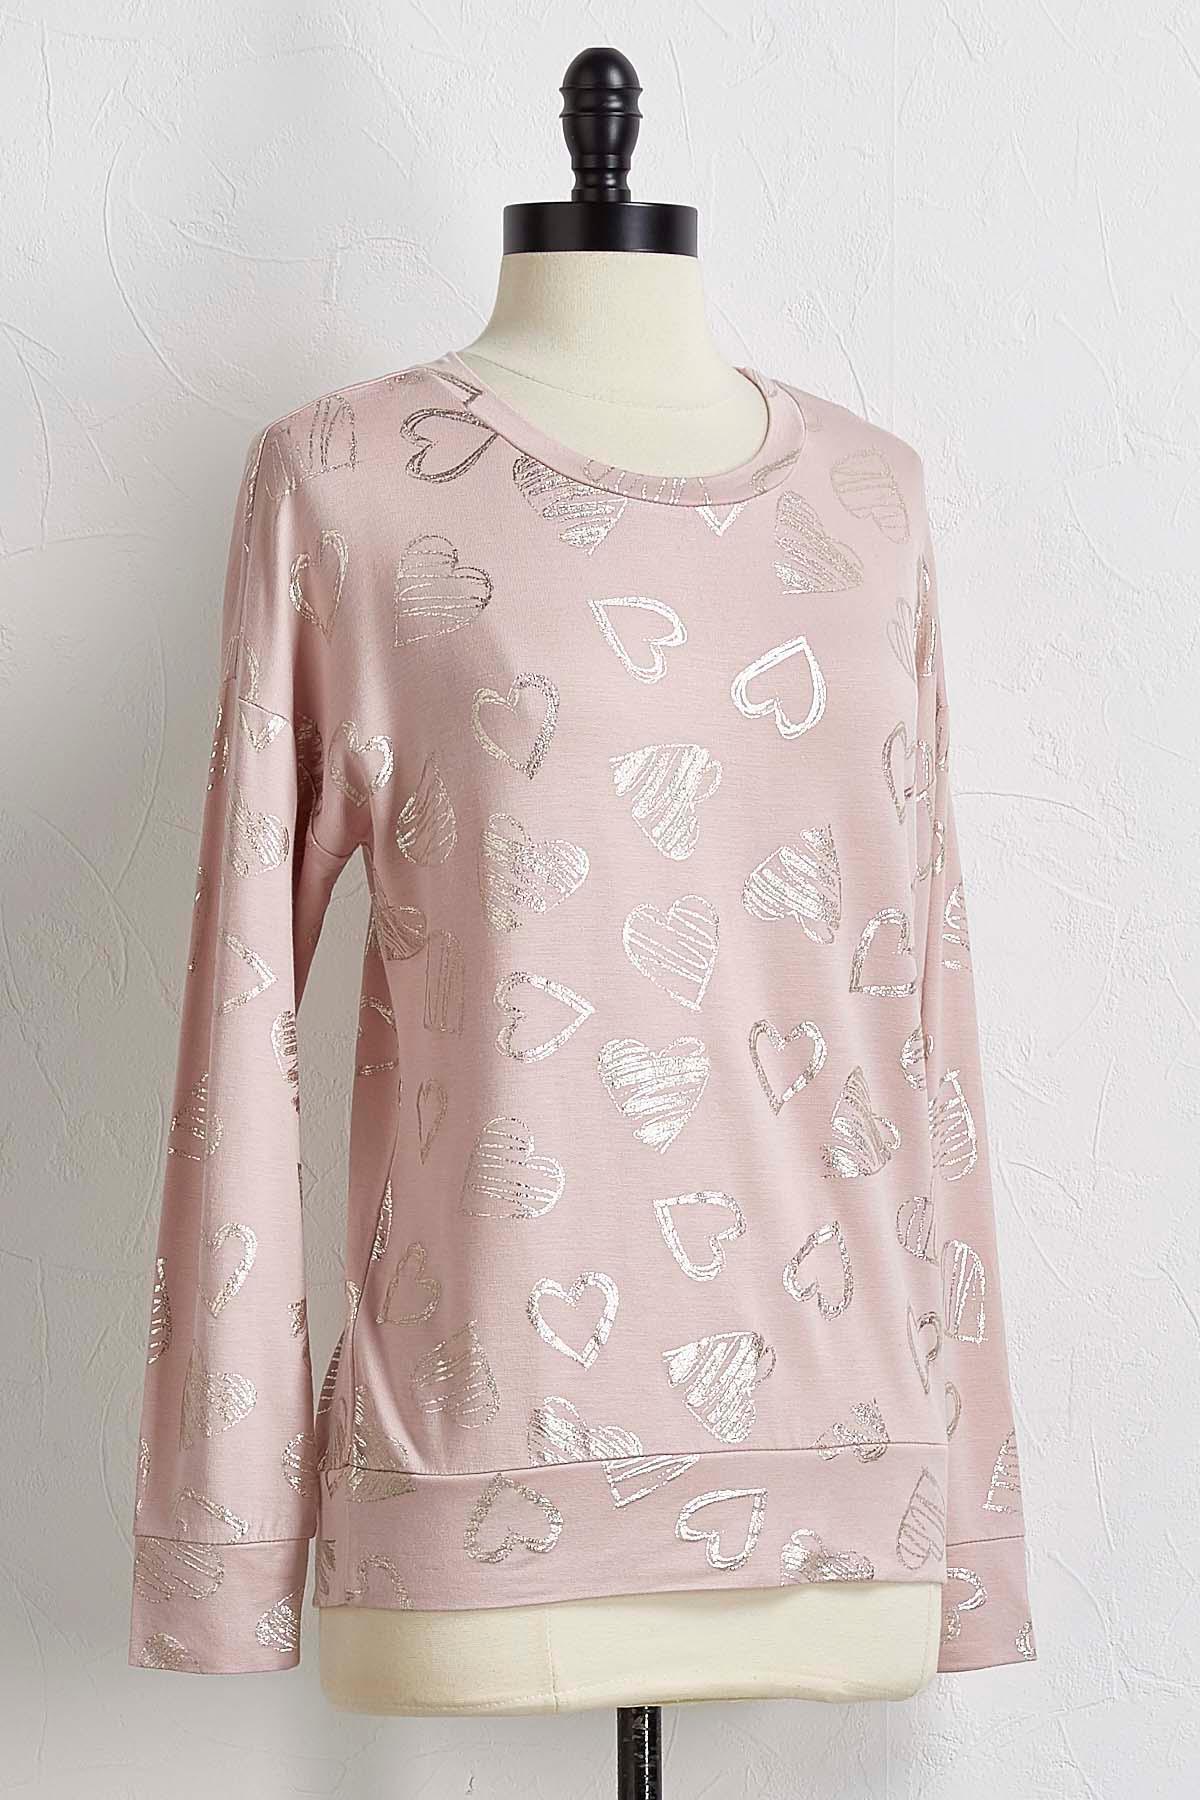 Foiled Heart Sweatshirt